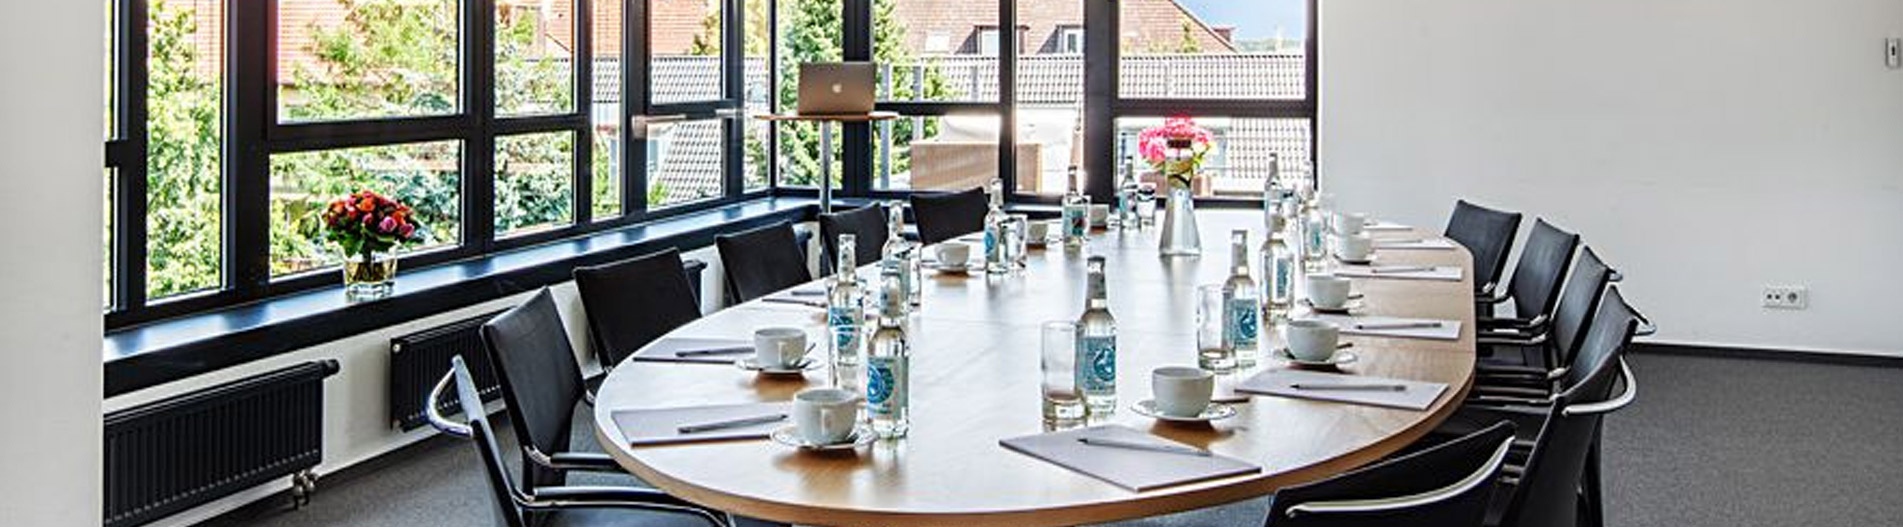 Rent your office in Hamburg Eppendorf